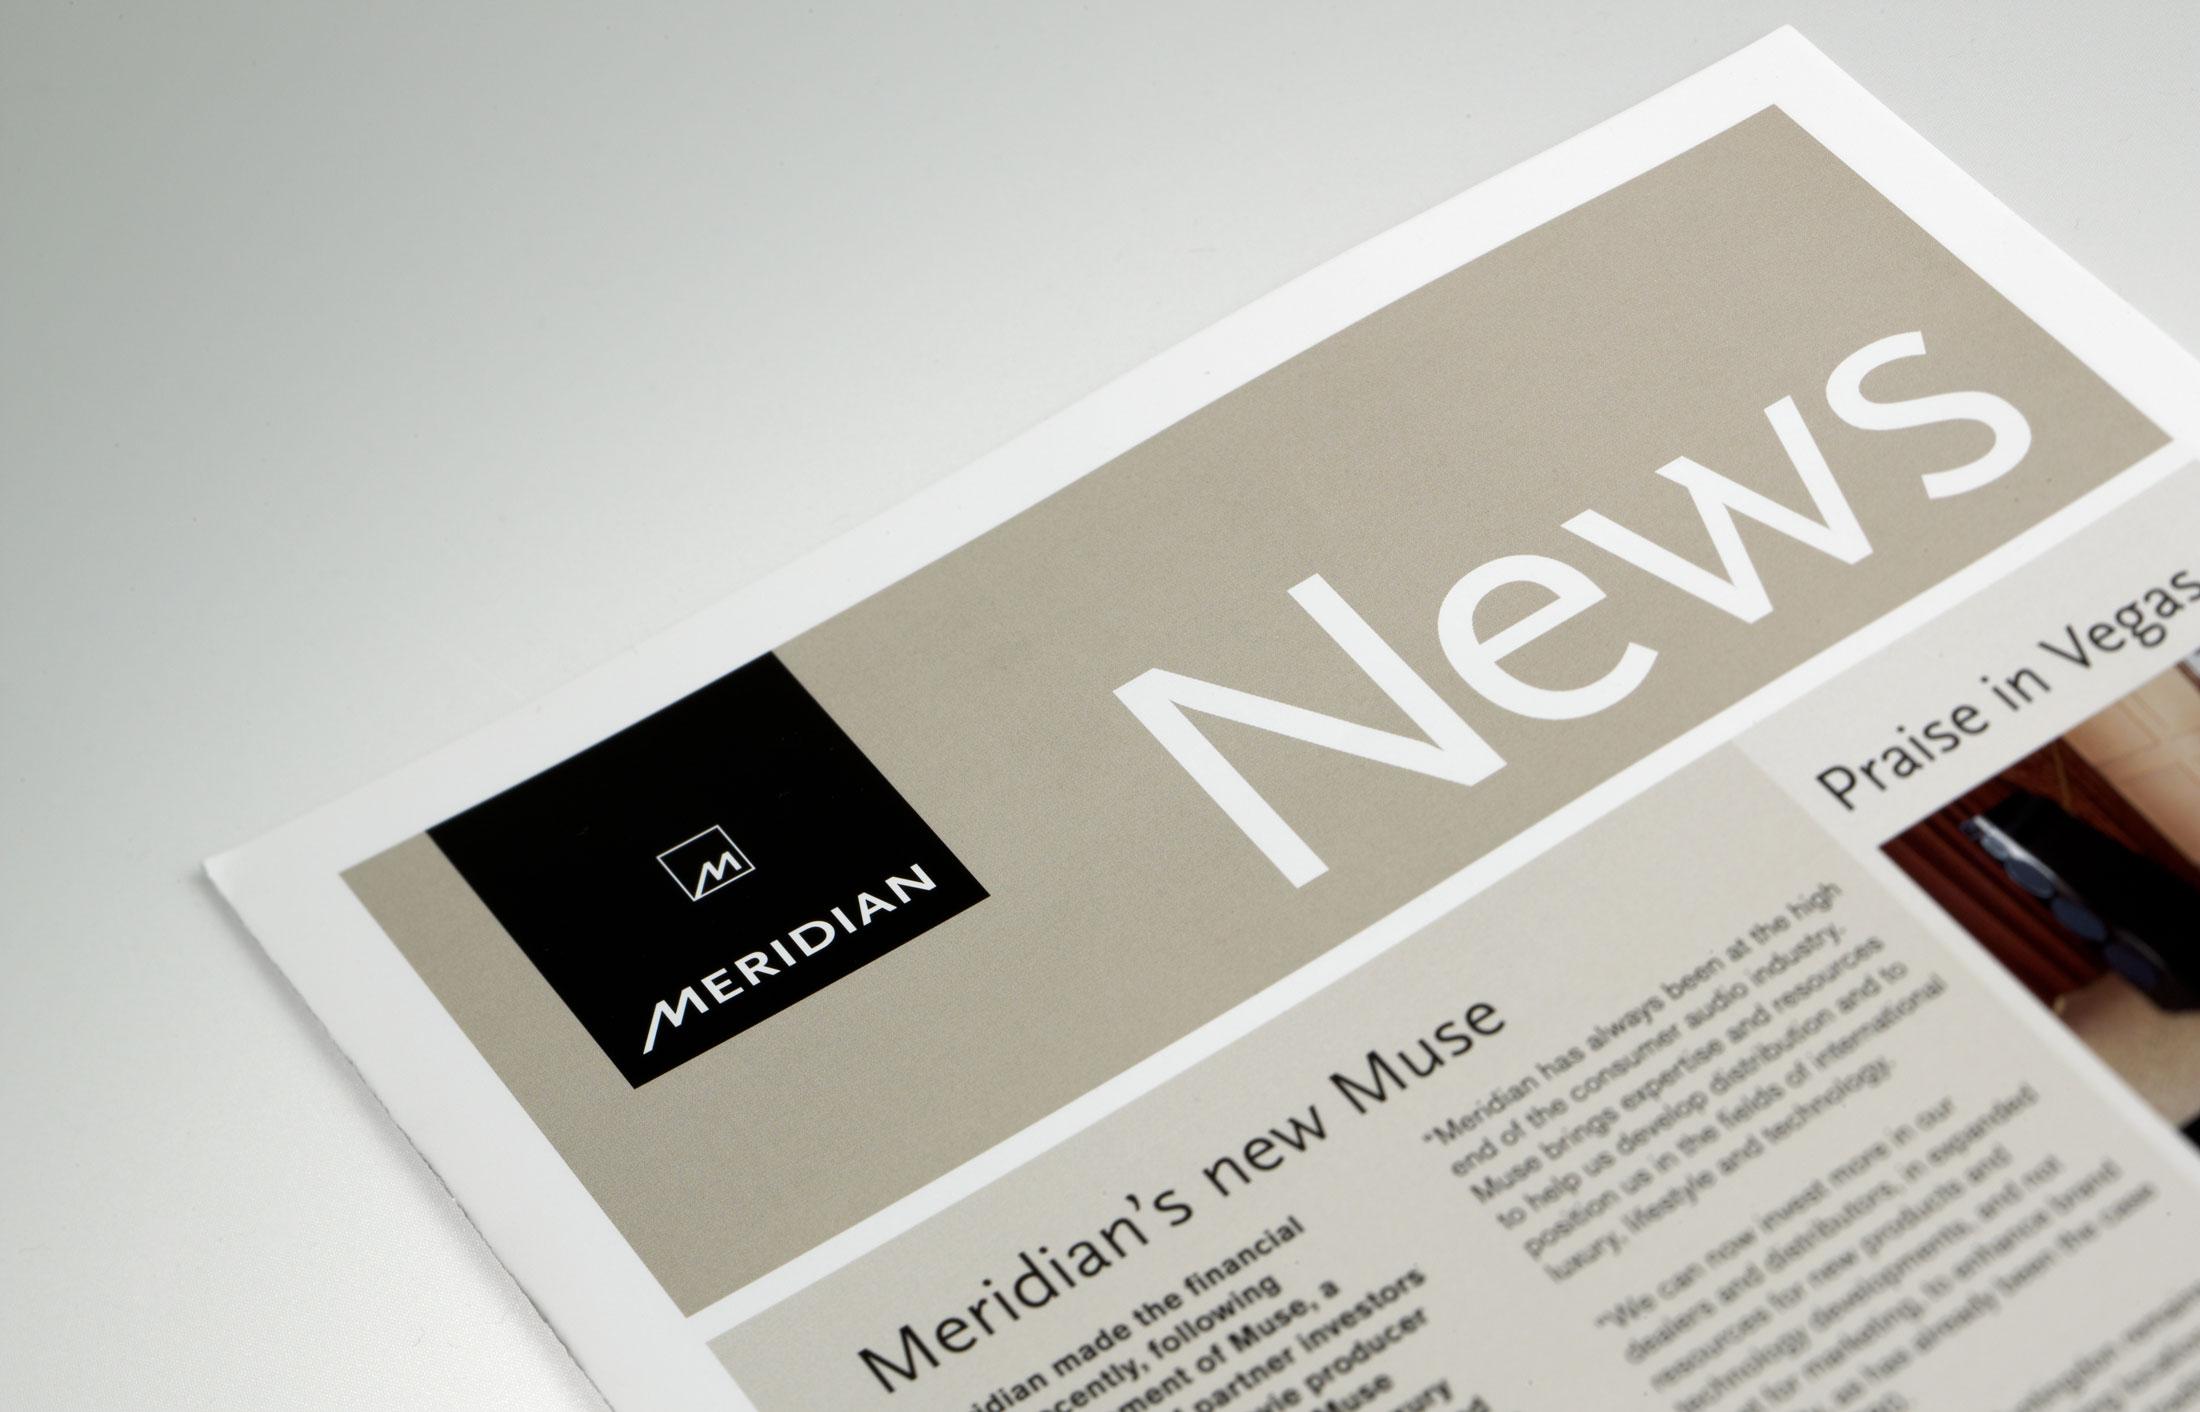 Branding identity design for Meridian Audio